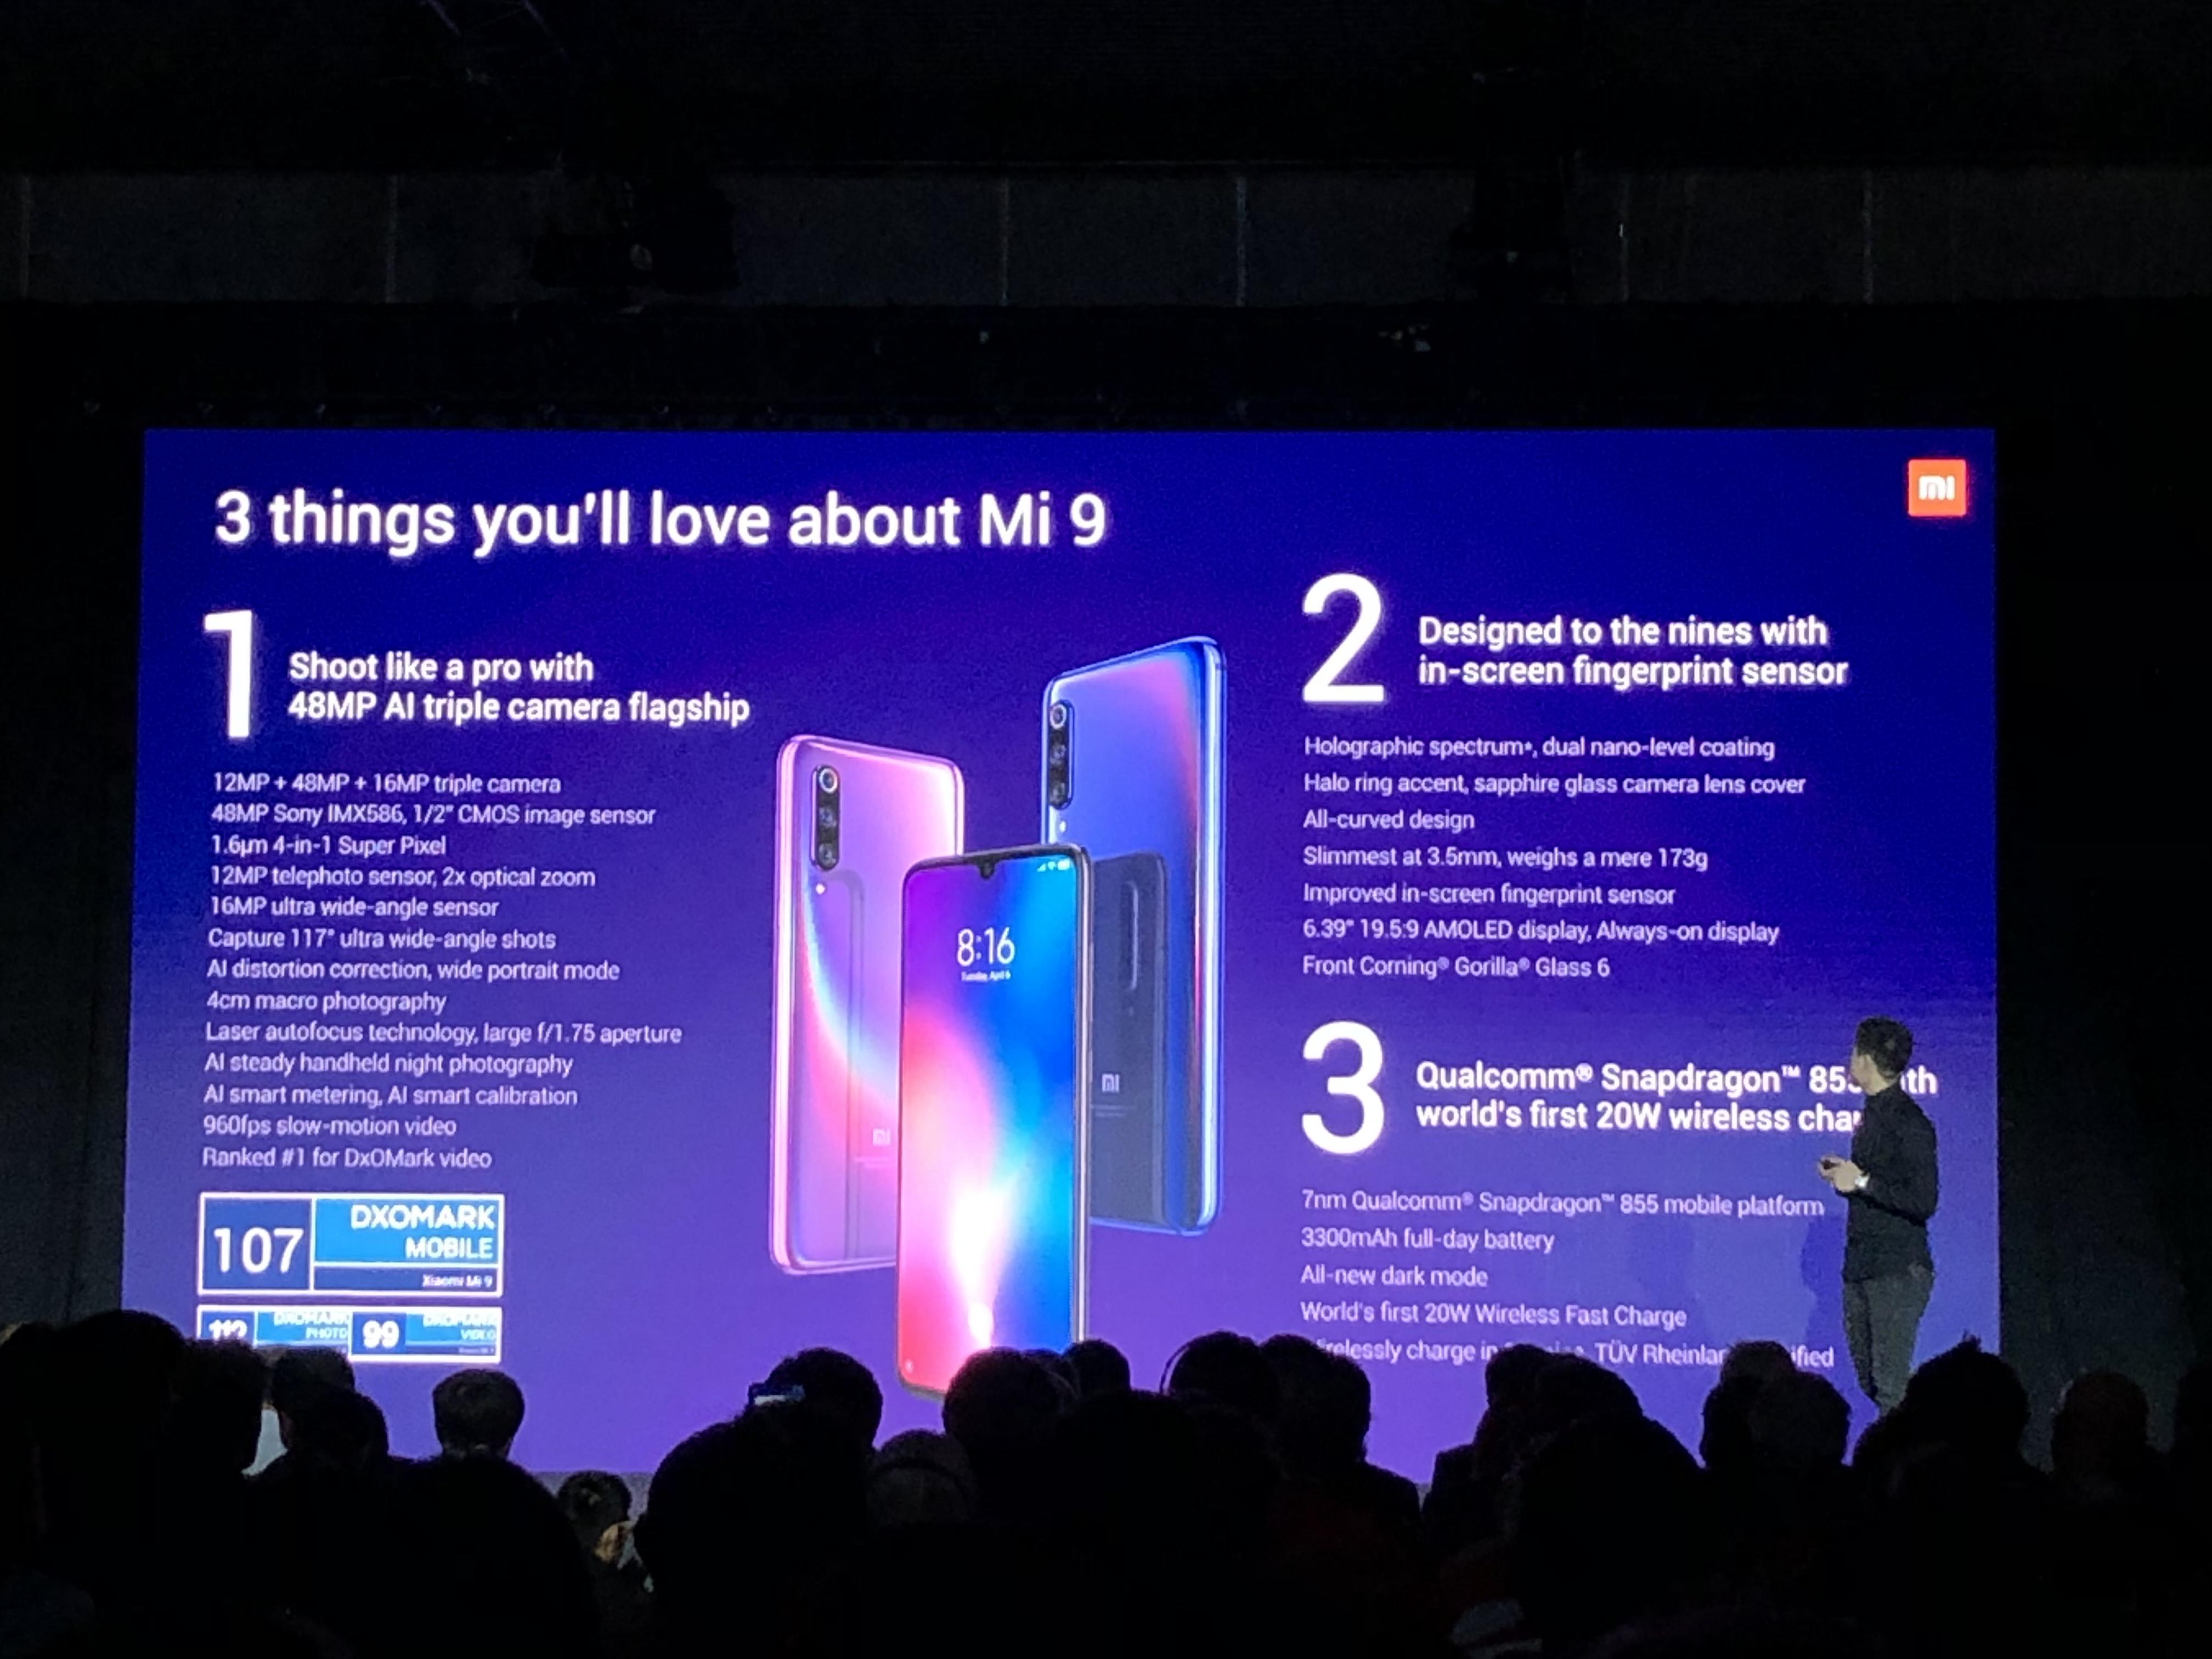 Xiaomi announces its first 5G phone, the Mi Mix 3 5G | TechCrunch